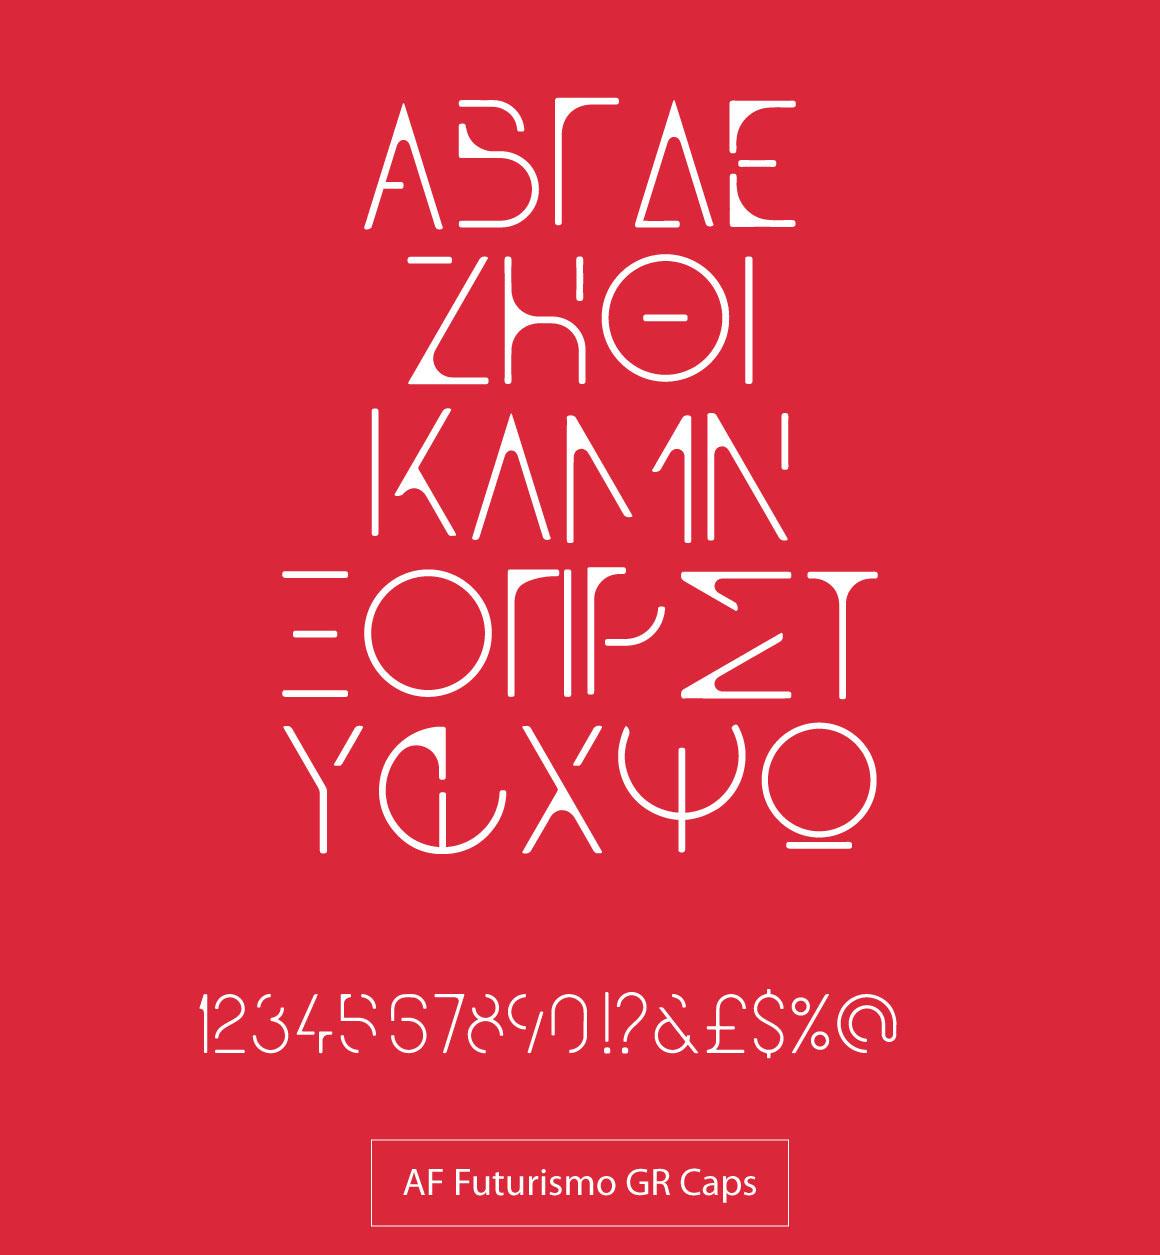 freegreekfont,freefont,FreeFonts,greekfonts,greek,designers,fonts,font,typography  ,freebies